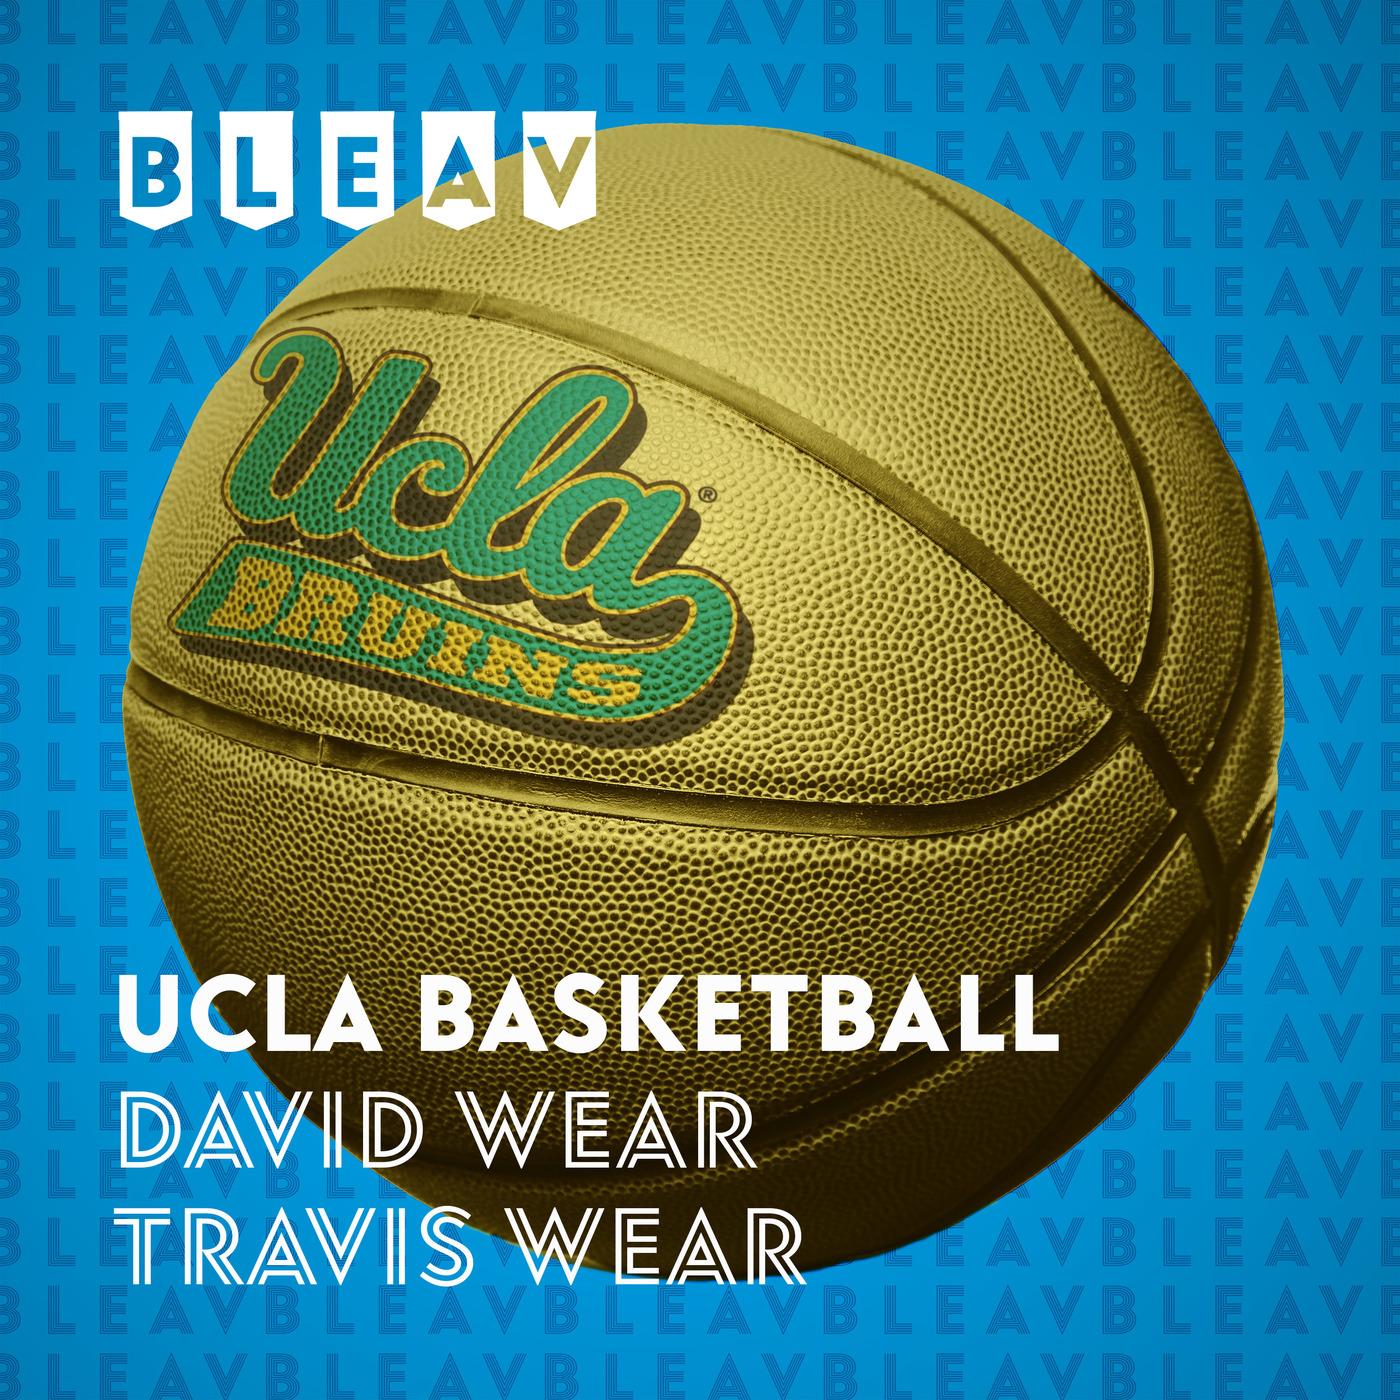 Episode 8. UCLA Men's Basketball